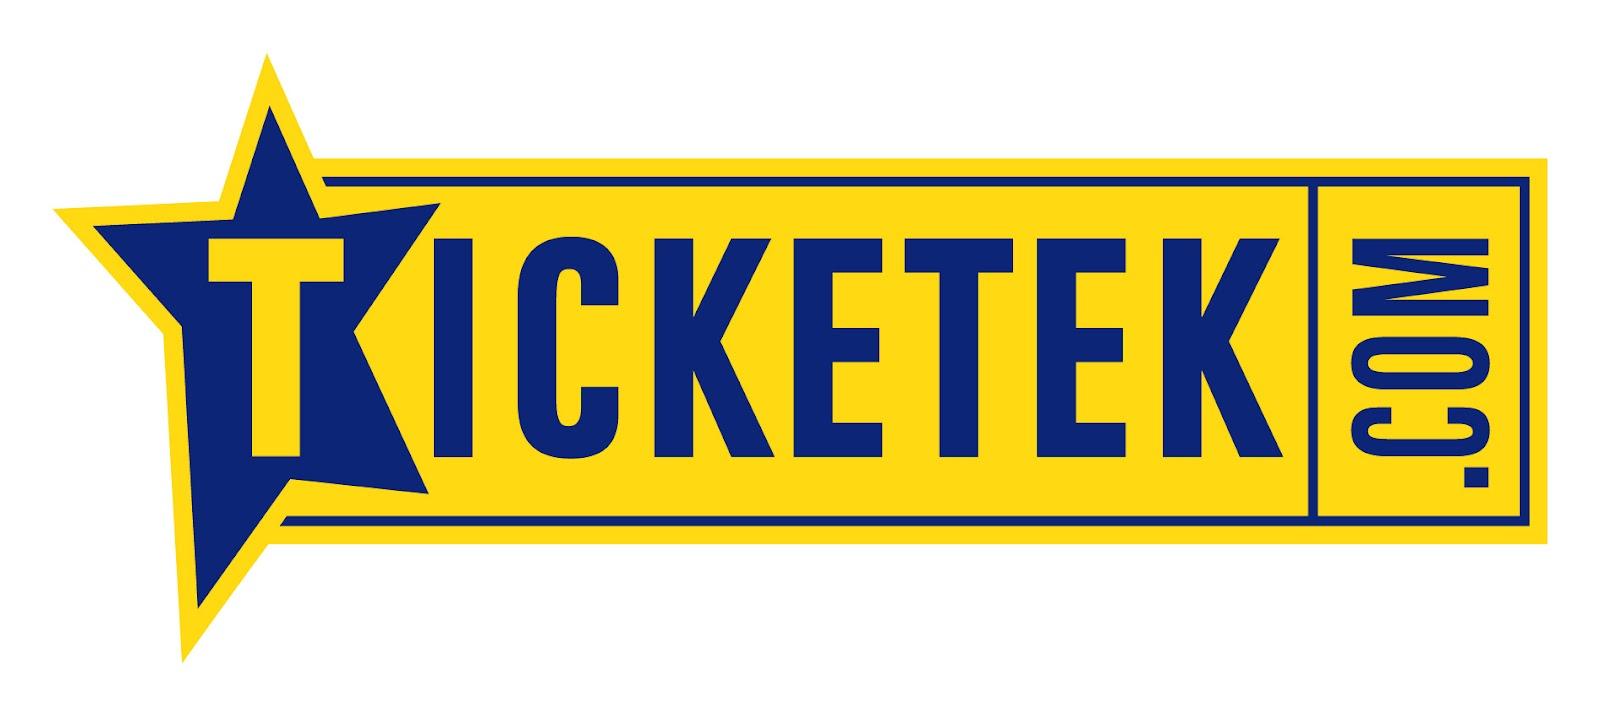 ticketek-logo.jpg